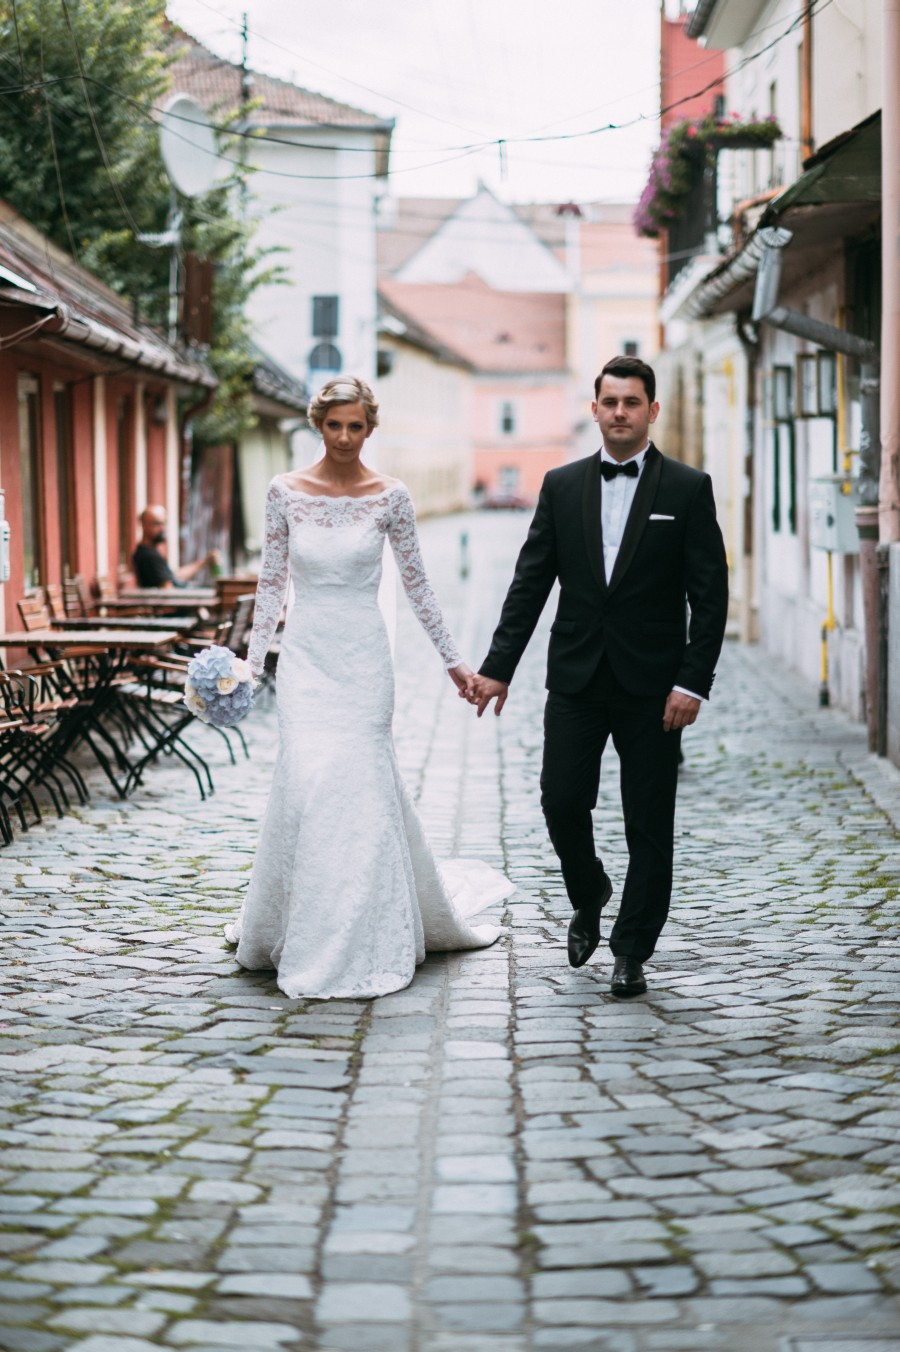 wedding+cluj+napoca+radubenjamin_053